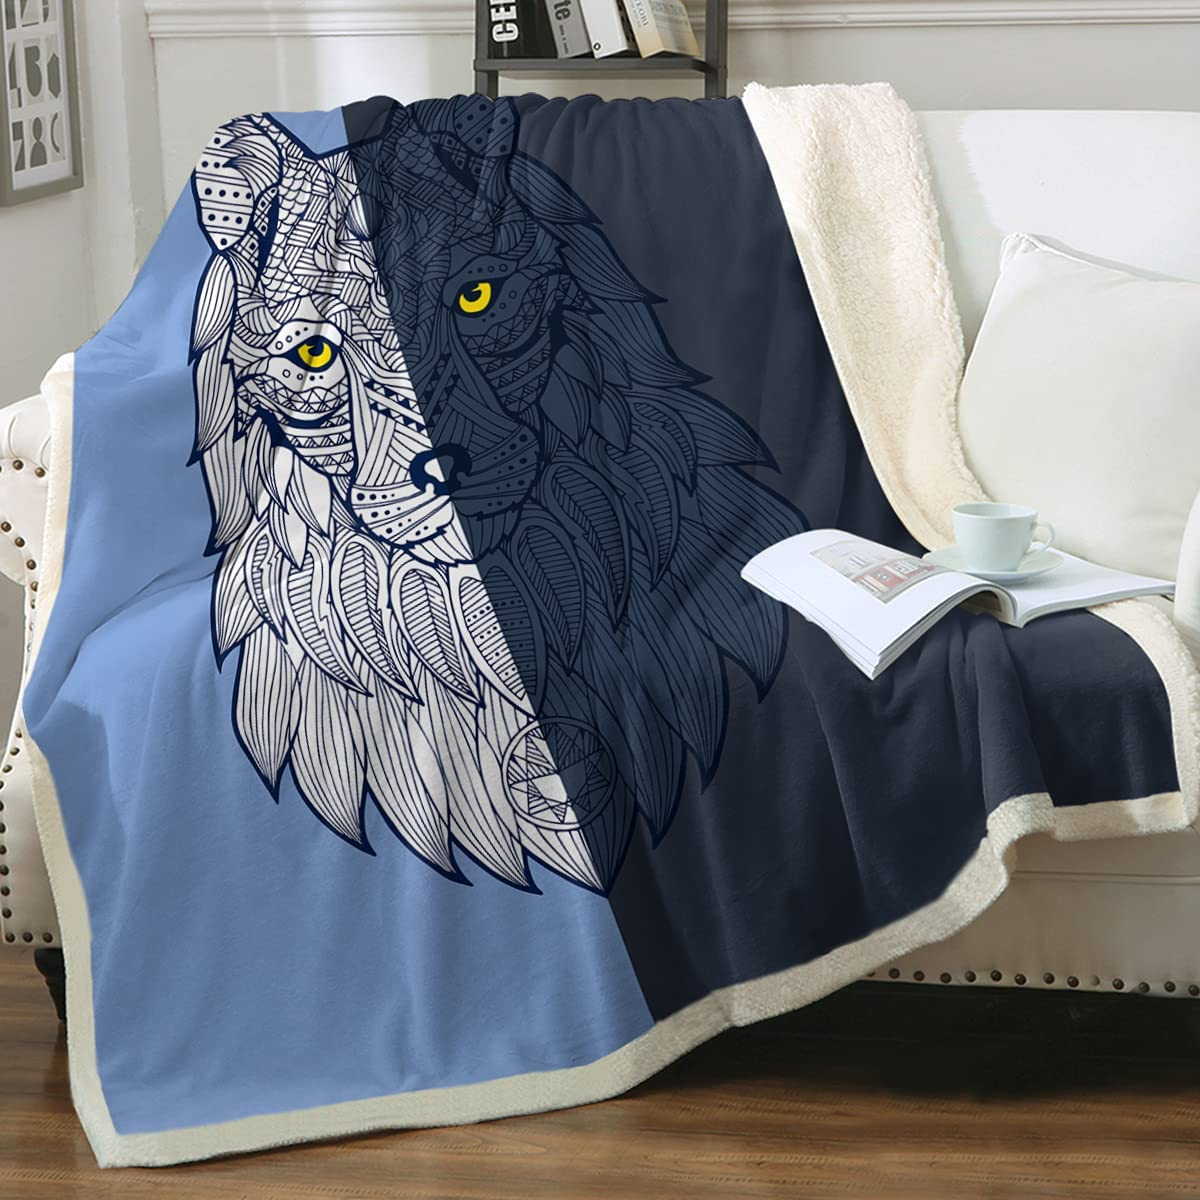 Sleepwish Wolf Blanket Blue Tribal Direct stock discount Wol Fleece Soft Long-awaited Throw